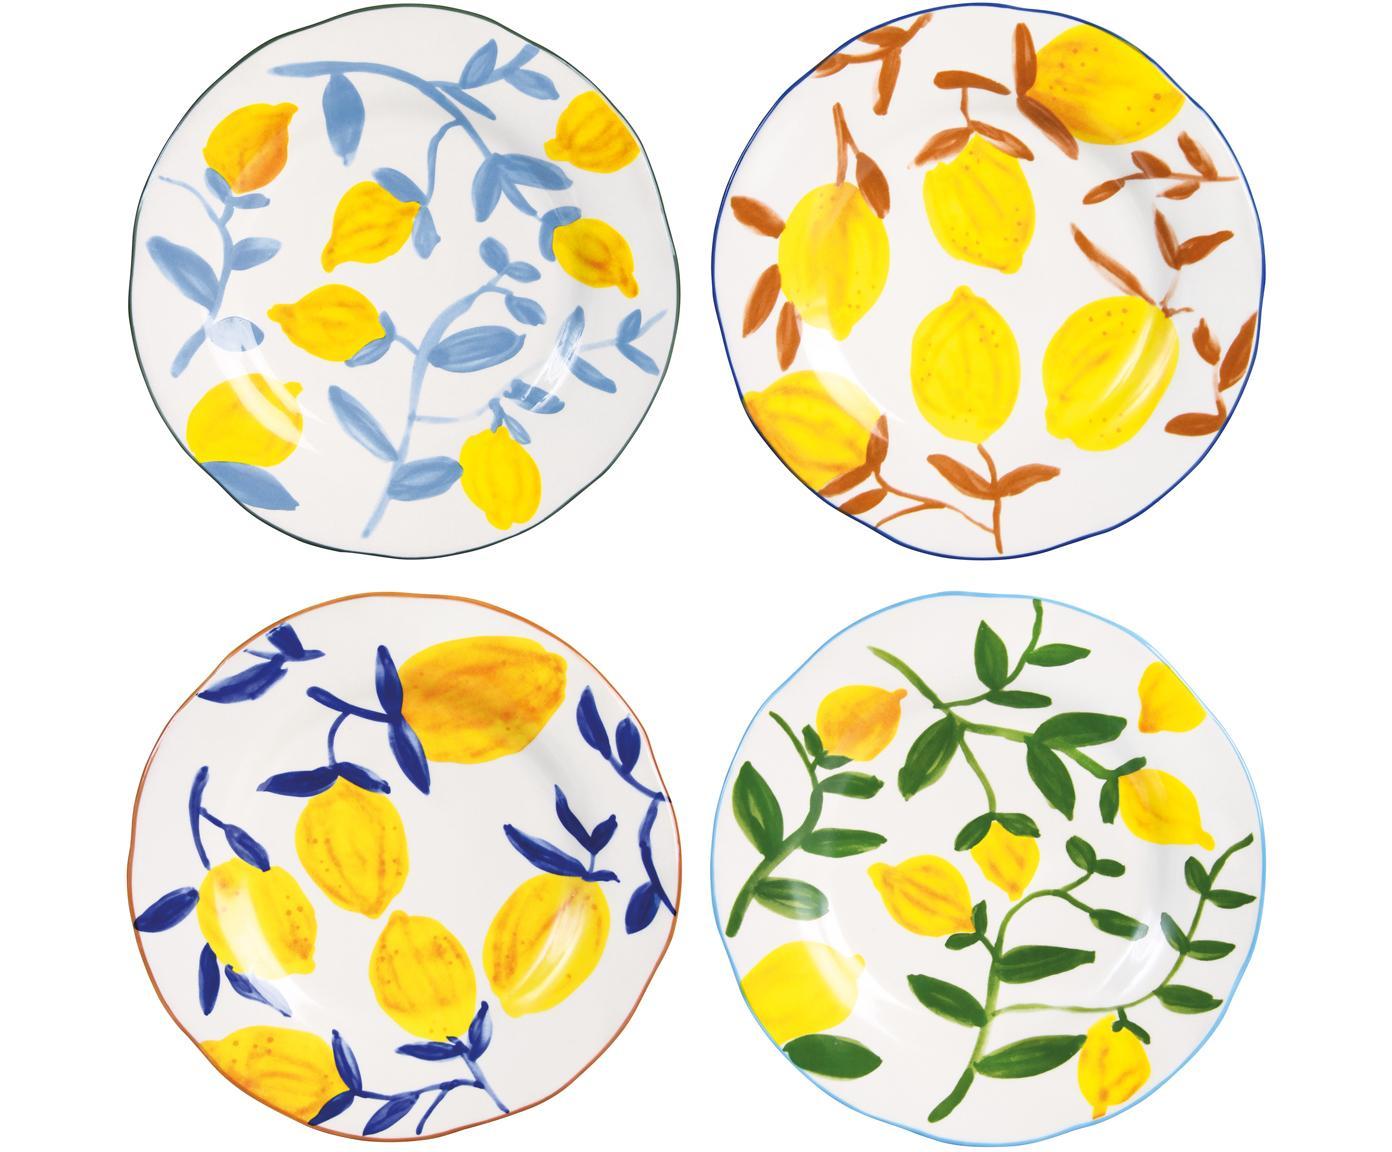 Frühstücksteller Lemon Twig mit Zitronen-Motiv, 4er-Set, Steingut, Mehrfarbig, Ø 22 cm